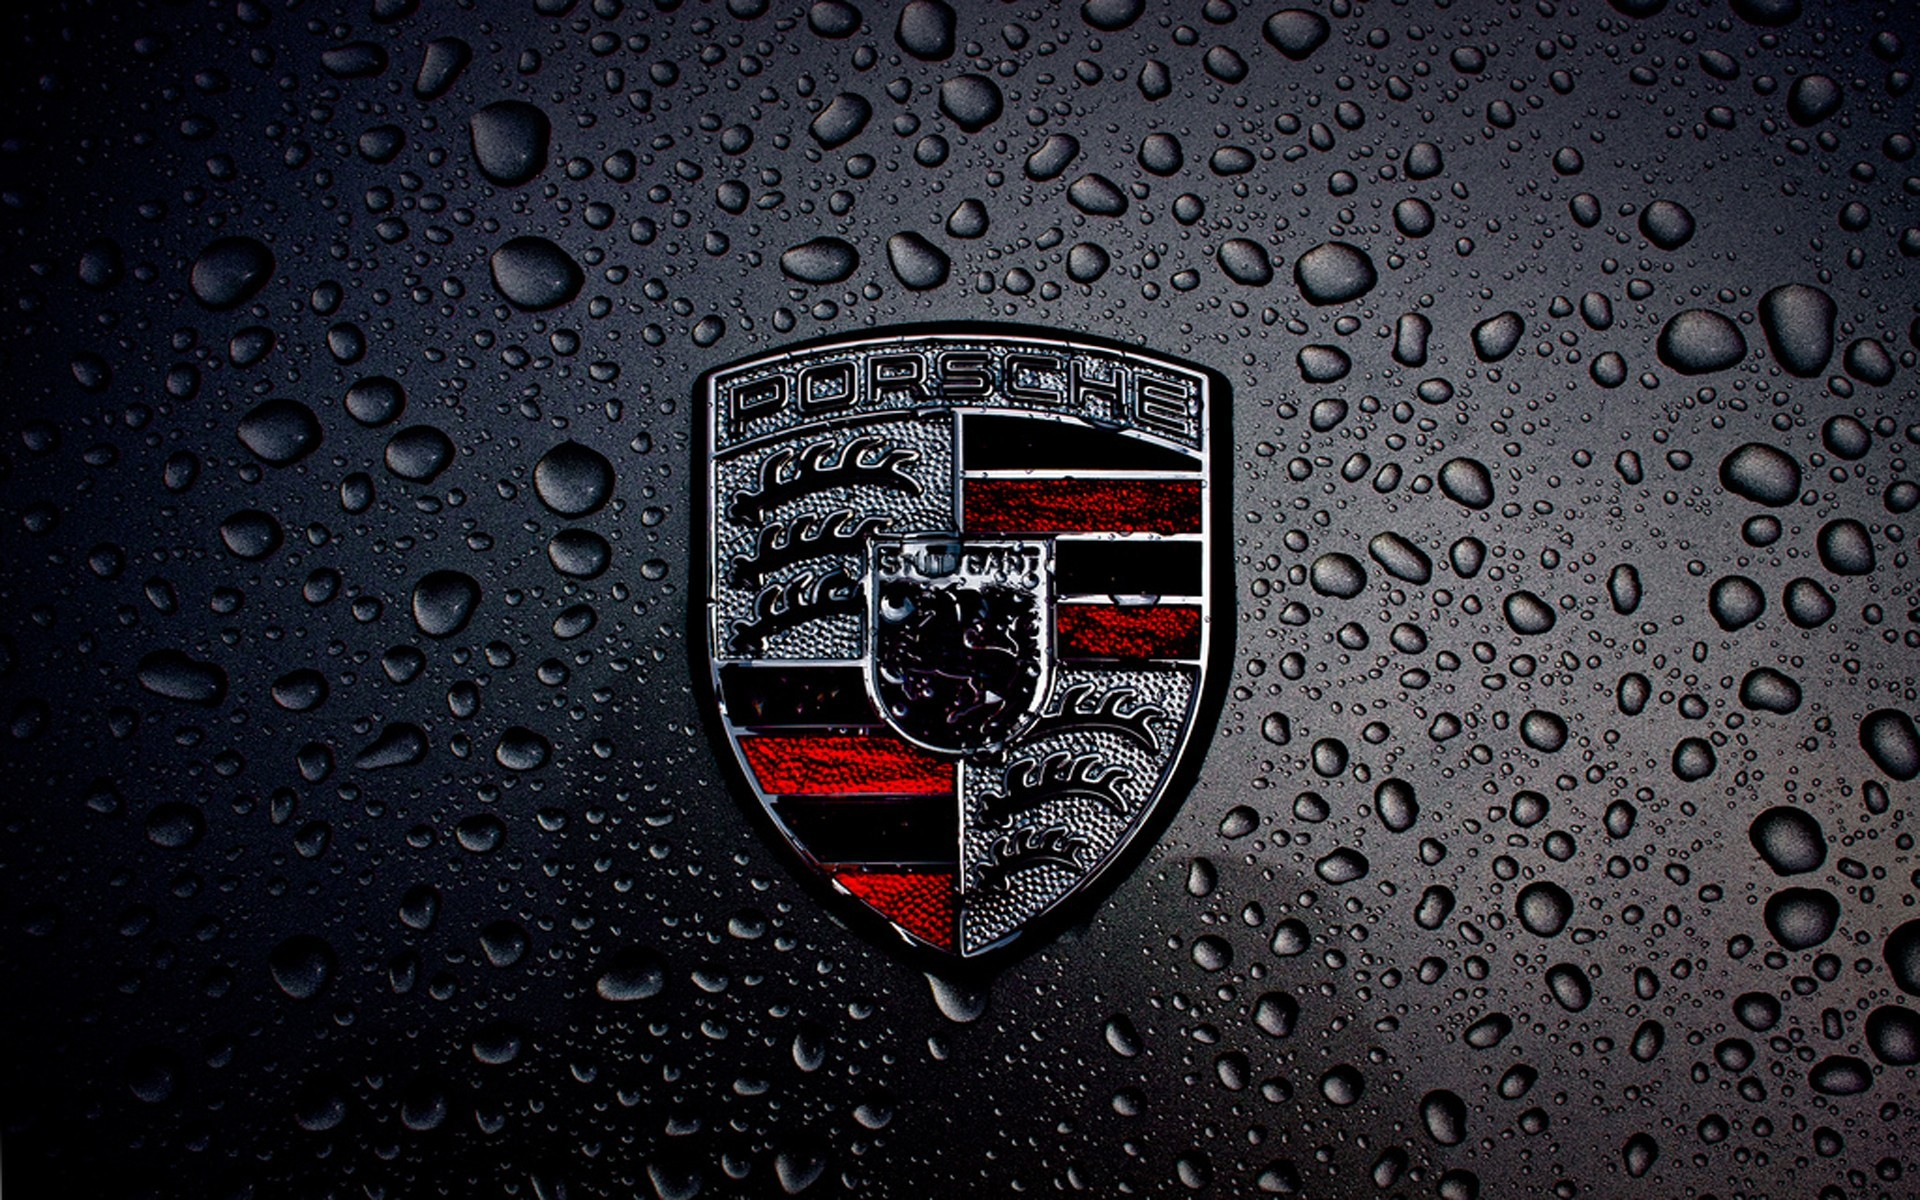 Porsche Logo   Data Src Download Porsche Logo Wallpapers - Porsche Logo Wallpaper 4k - HD Wallpaper